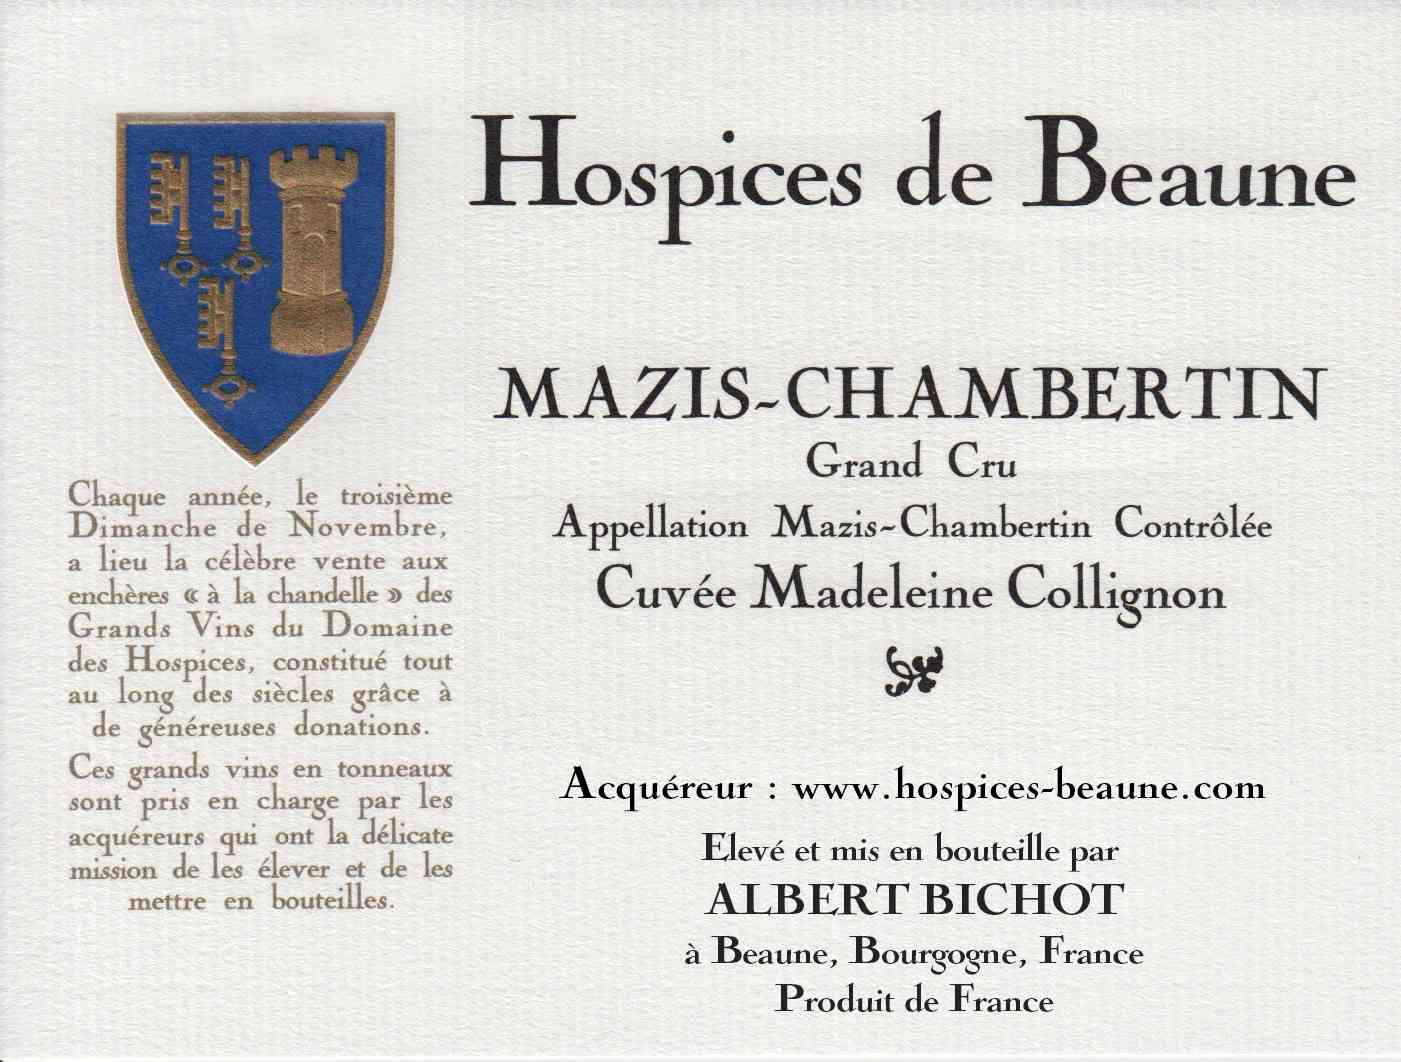 Encheres-auction-HospicesdeBeaune-AlbertBichot-MazisChambertin-GrandCru-Cuvee-MadeleineCollignon